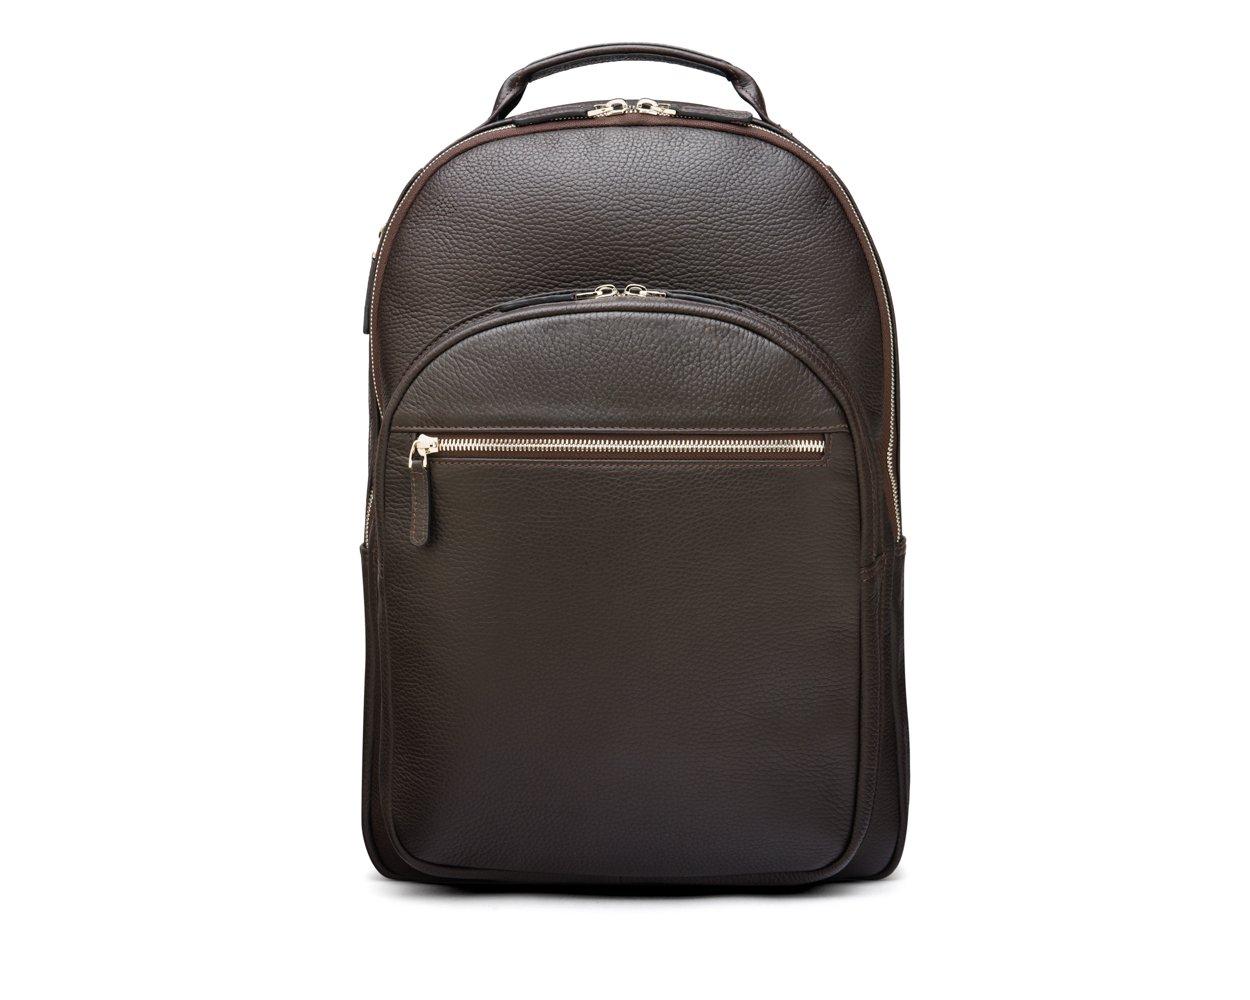 SAGEBROWN Brown Full Grain Cambridge Backpack